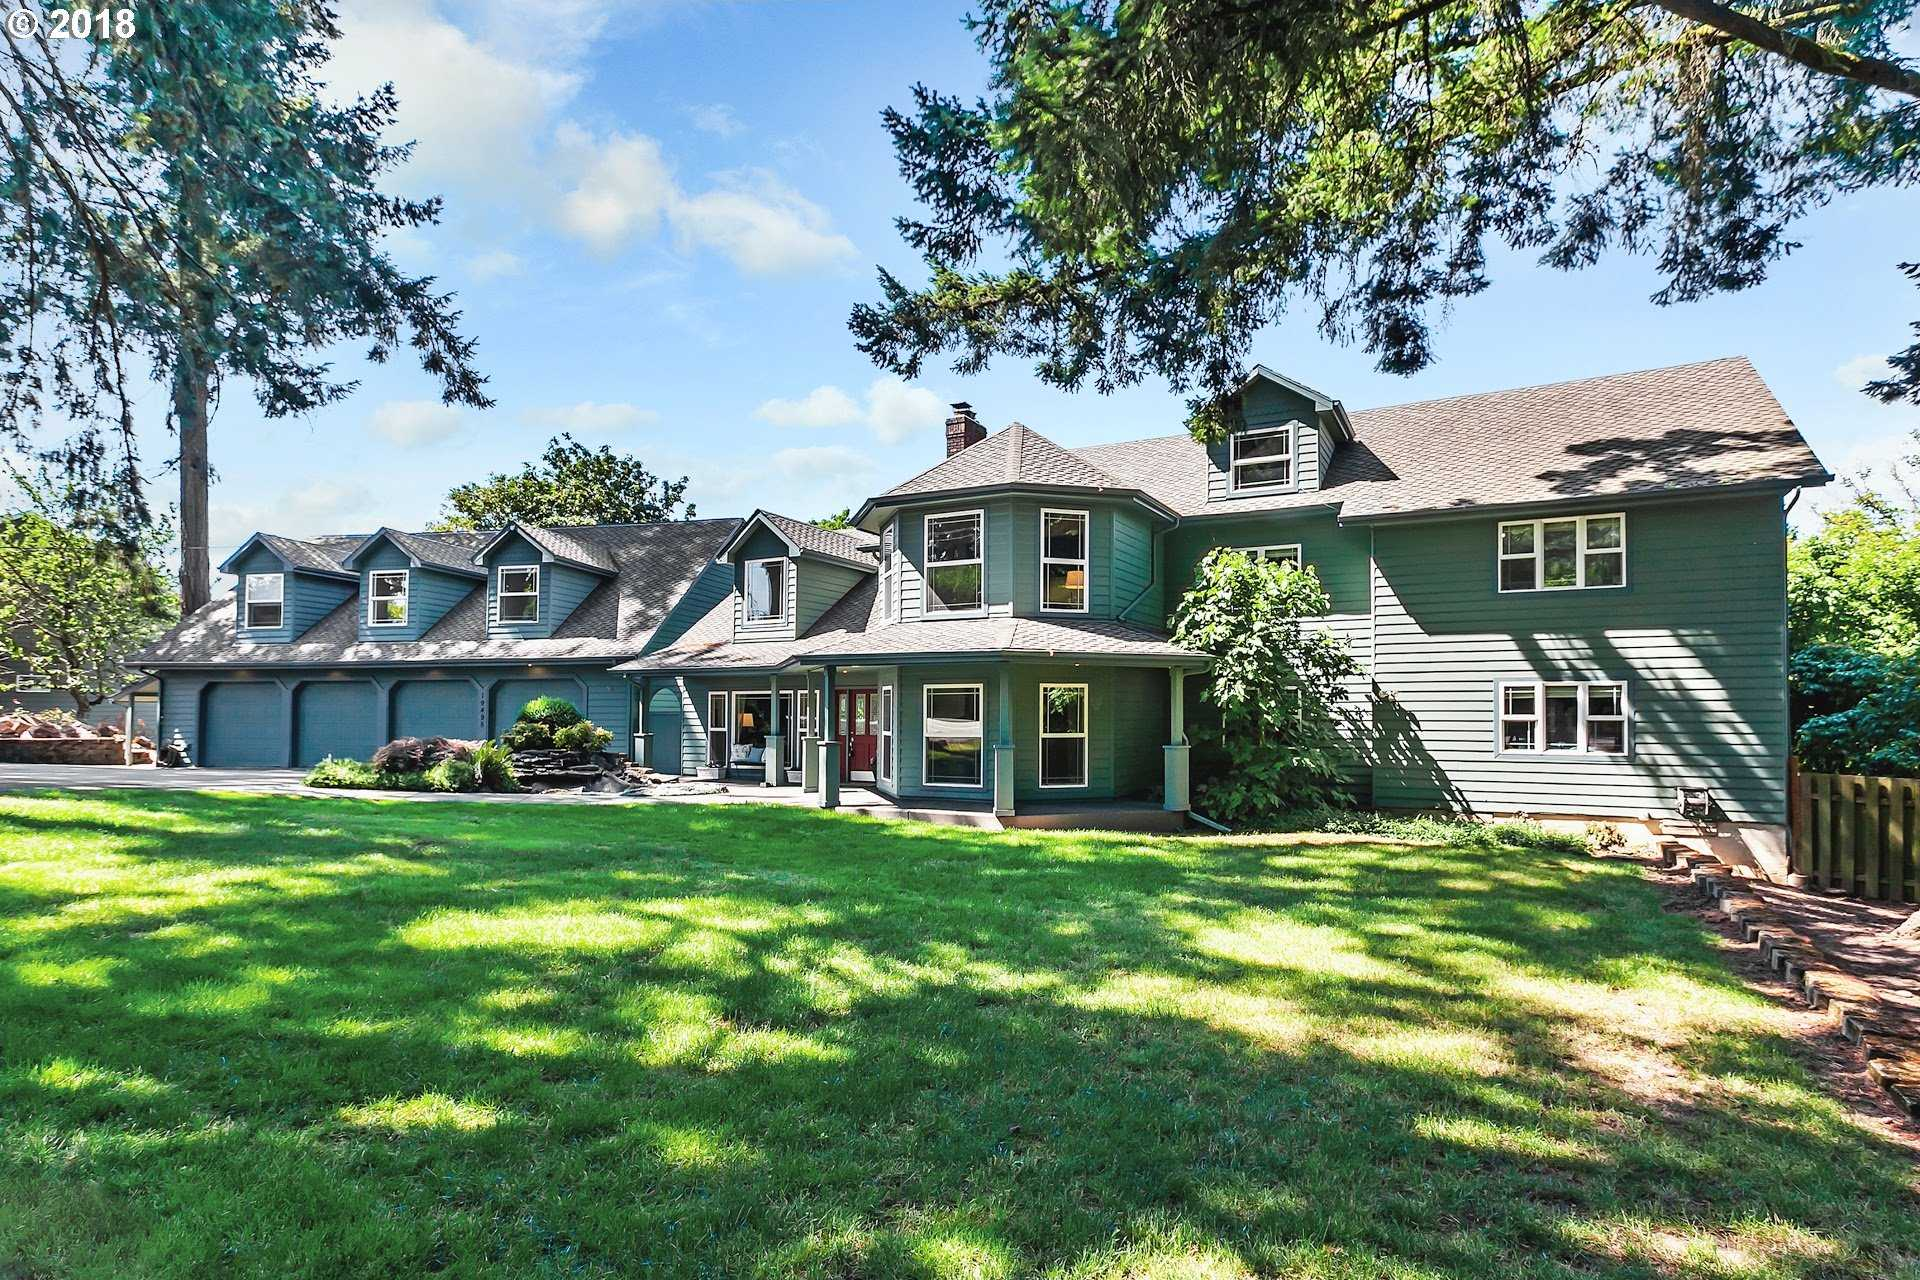 $895,000 - 6Br/4Ba -  for Sale in Beaverton